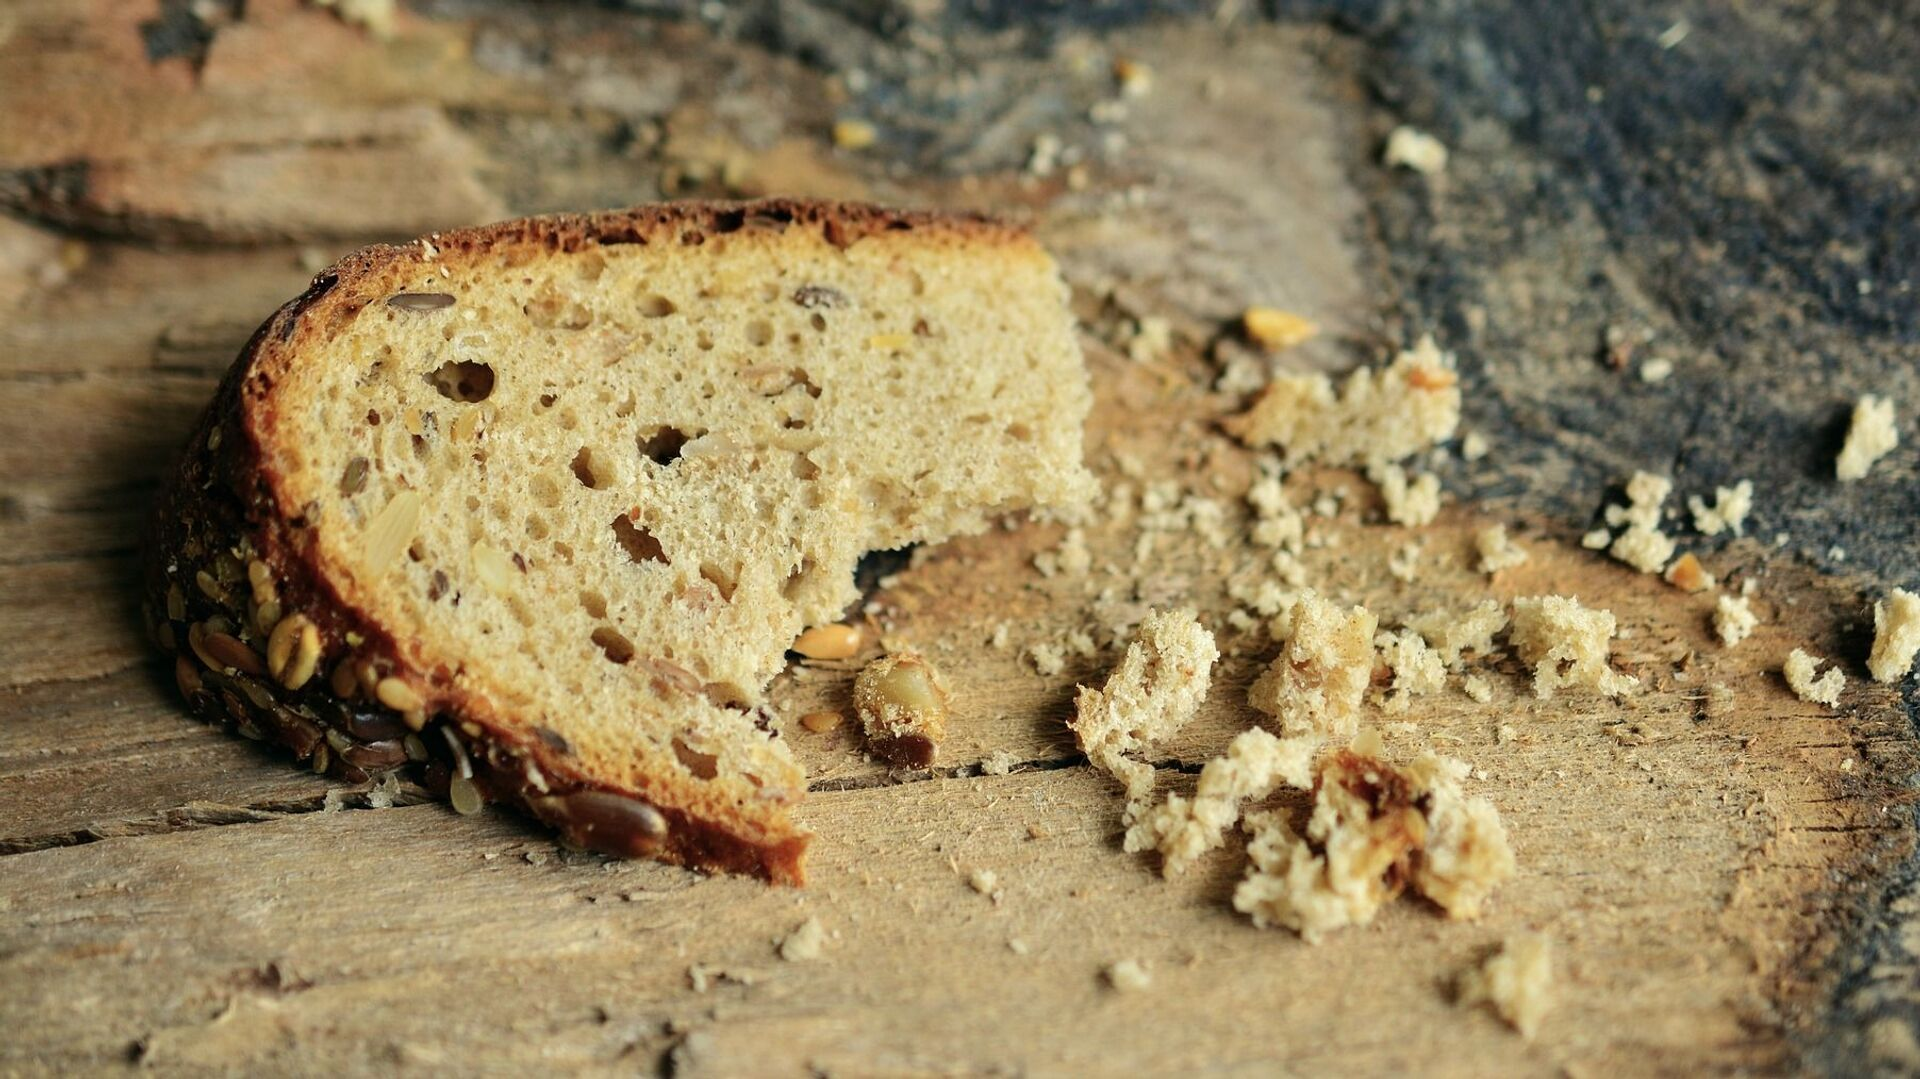 Un pedazo de pan (imagen referencial) - Sputnik Mundo, 1920, 12.07.2021